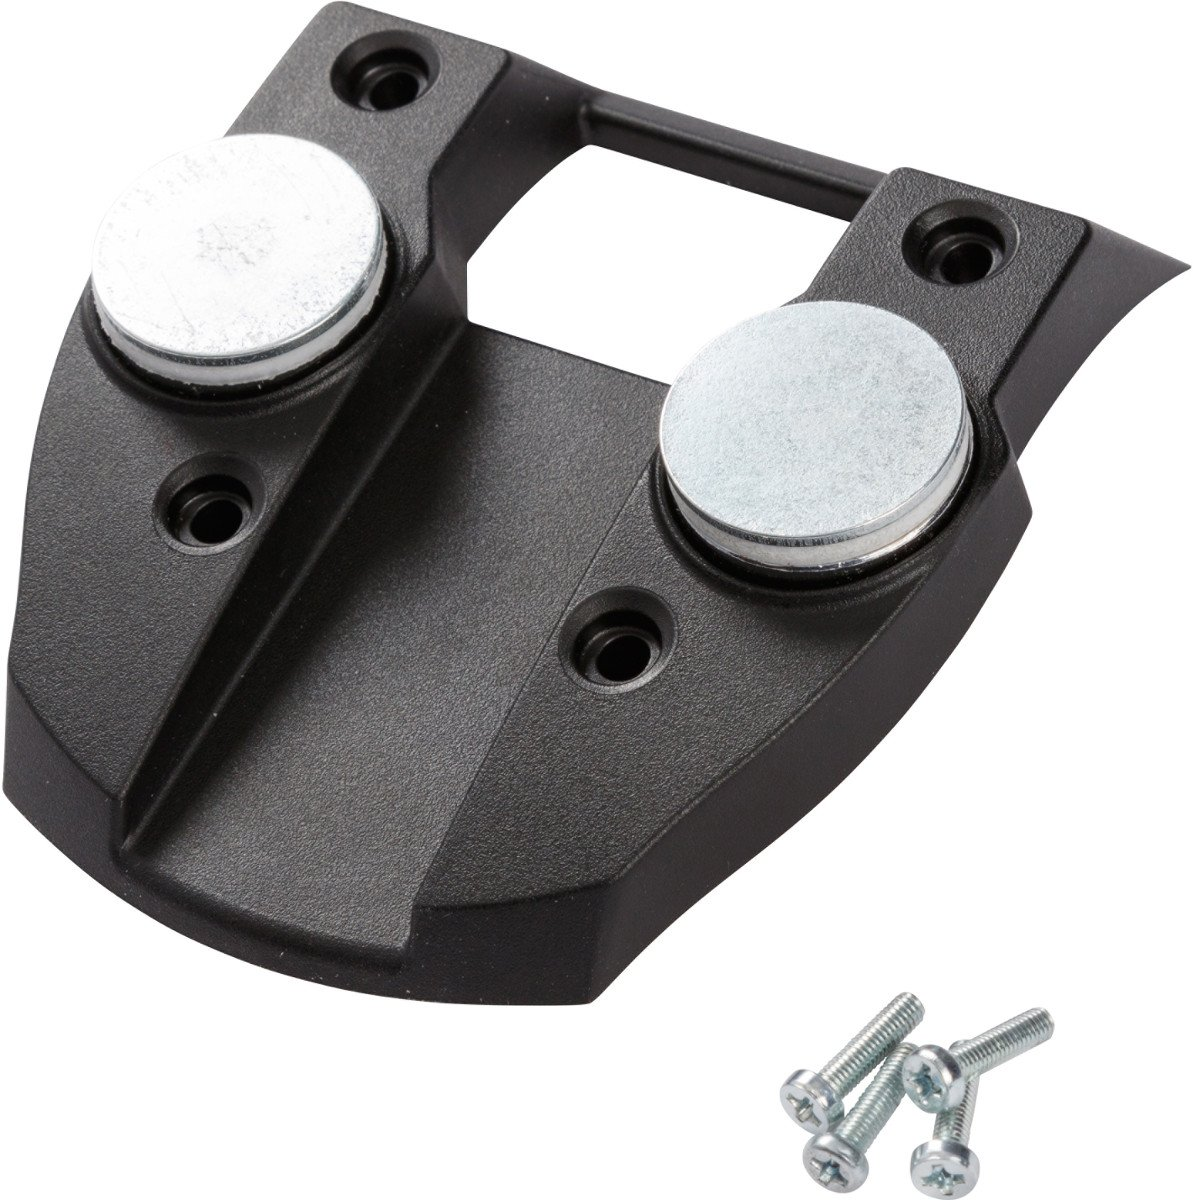 Brady BMP-Magnet-1 - Bmp61 Label Printer Accessory, Magnet Attachment, Black by Brady